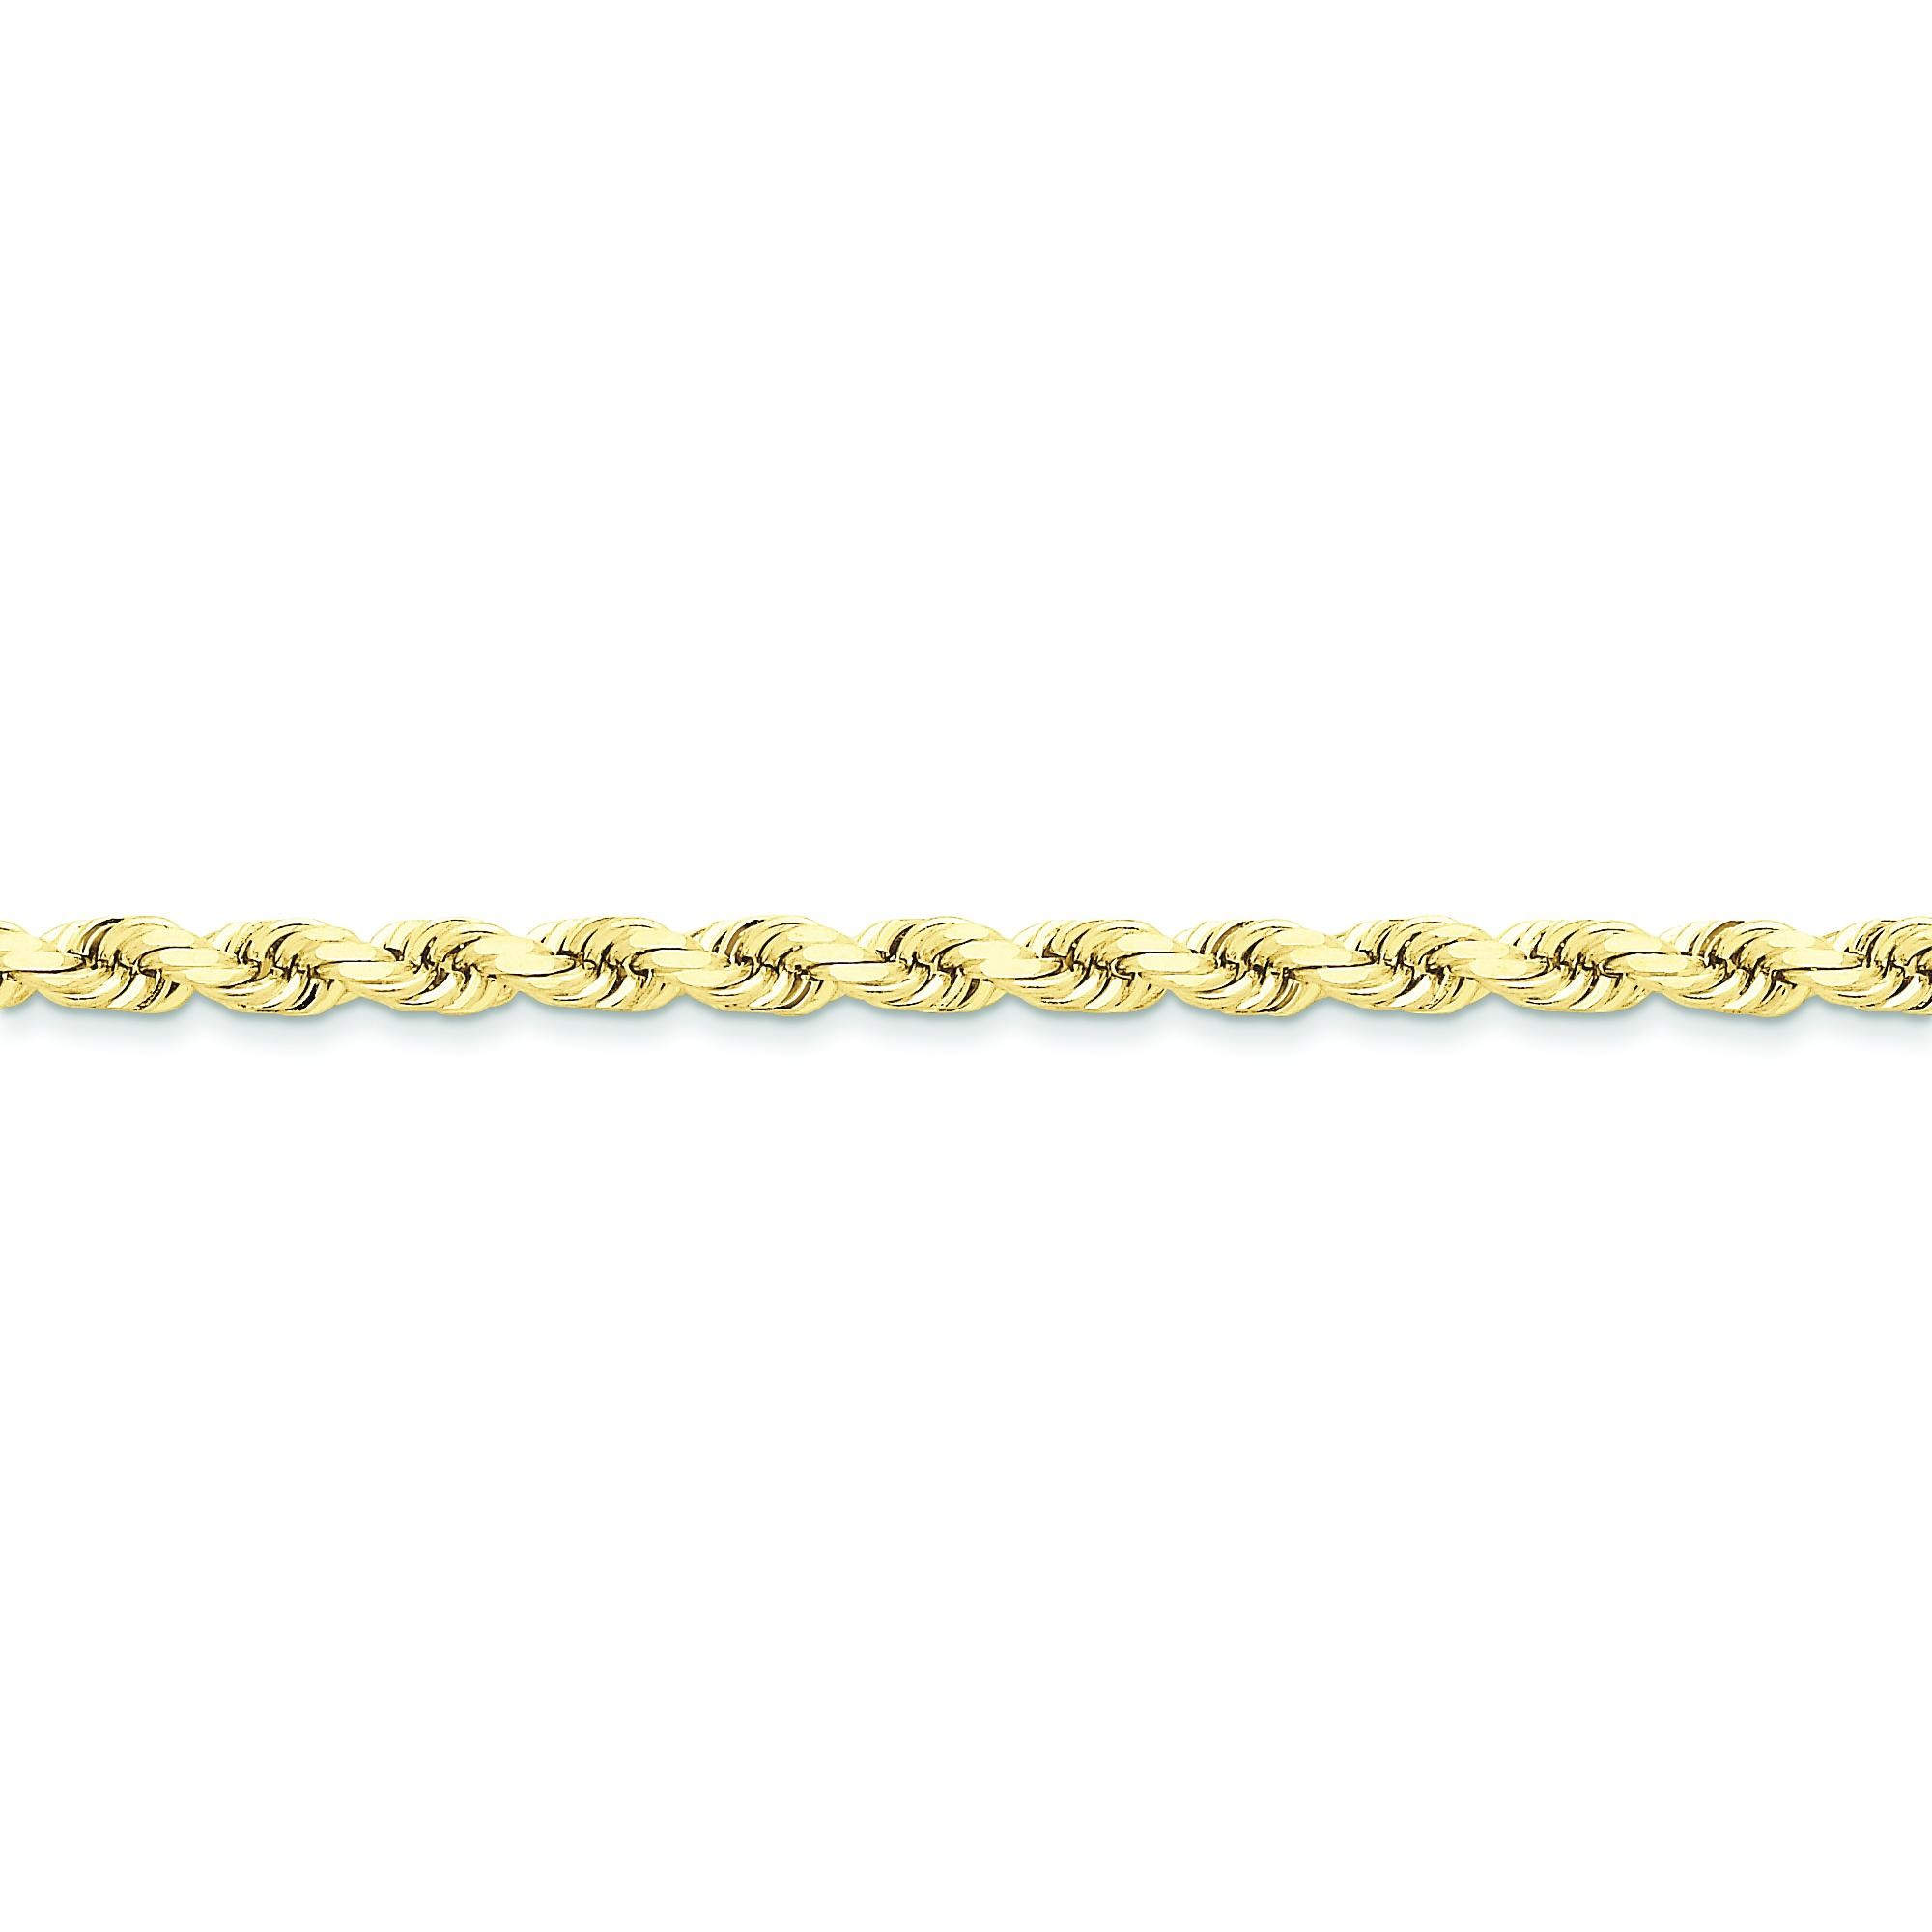 10k Yellow Gold 8 inch 5.00 mm Handmade Rope Chain Bracelet